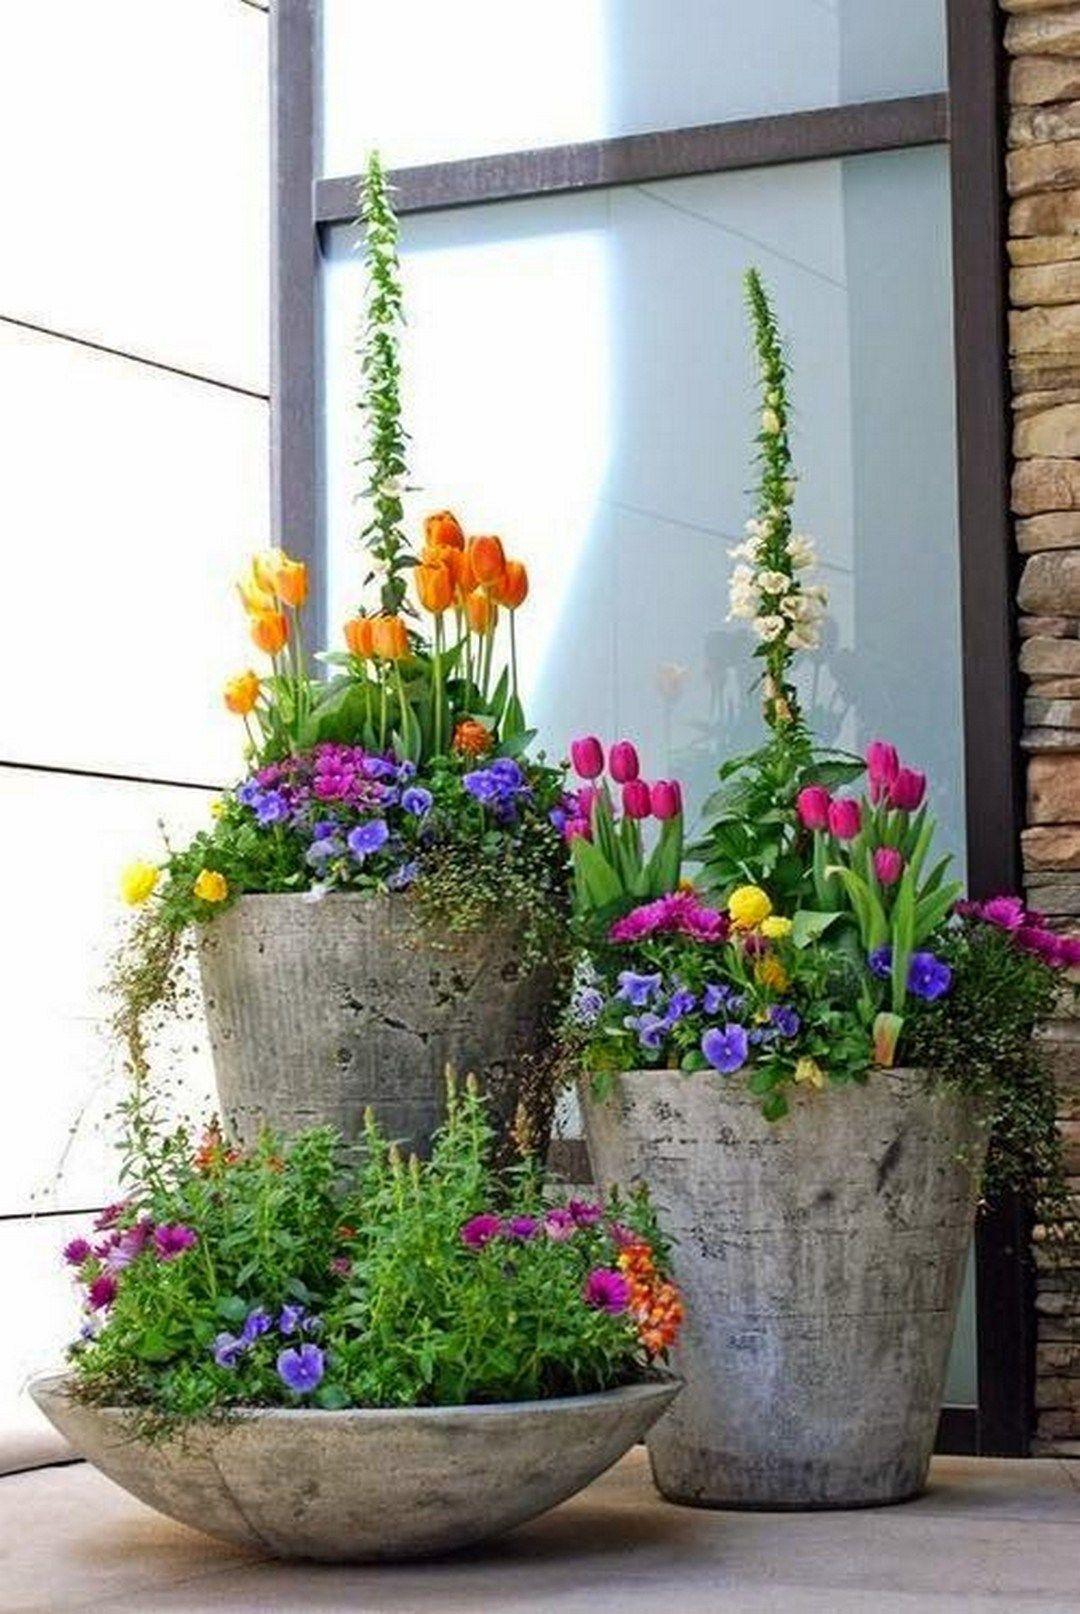 97 best garden images on pinterest